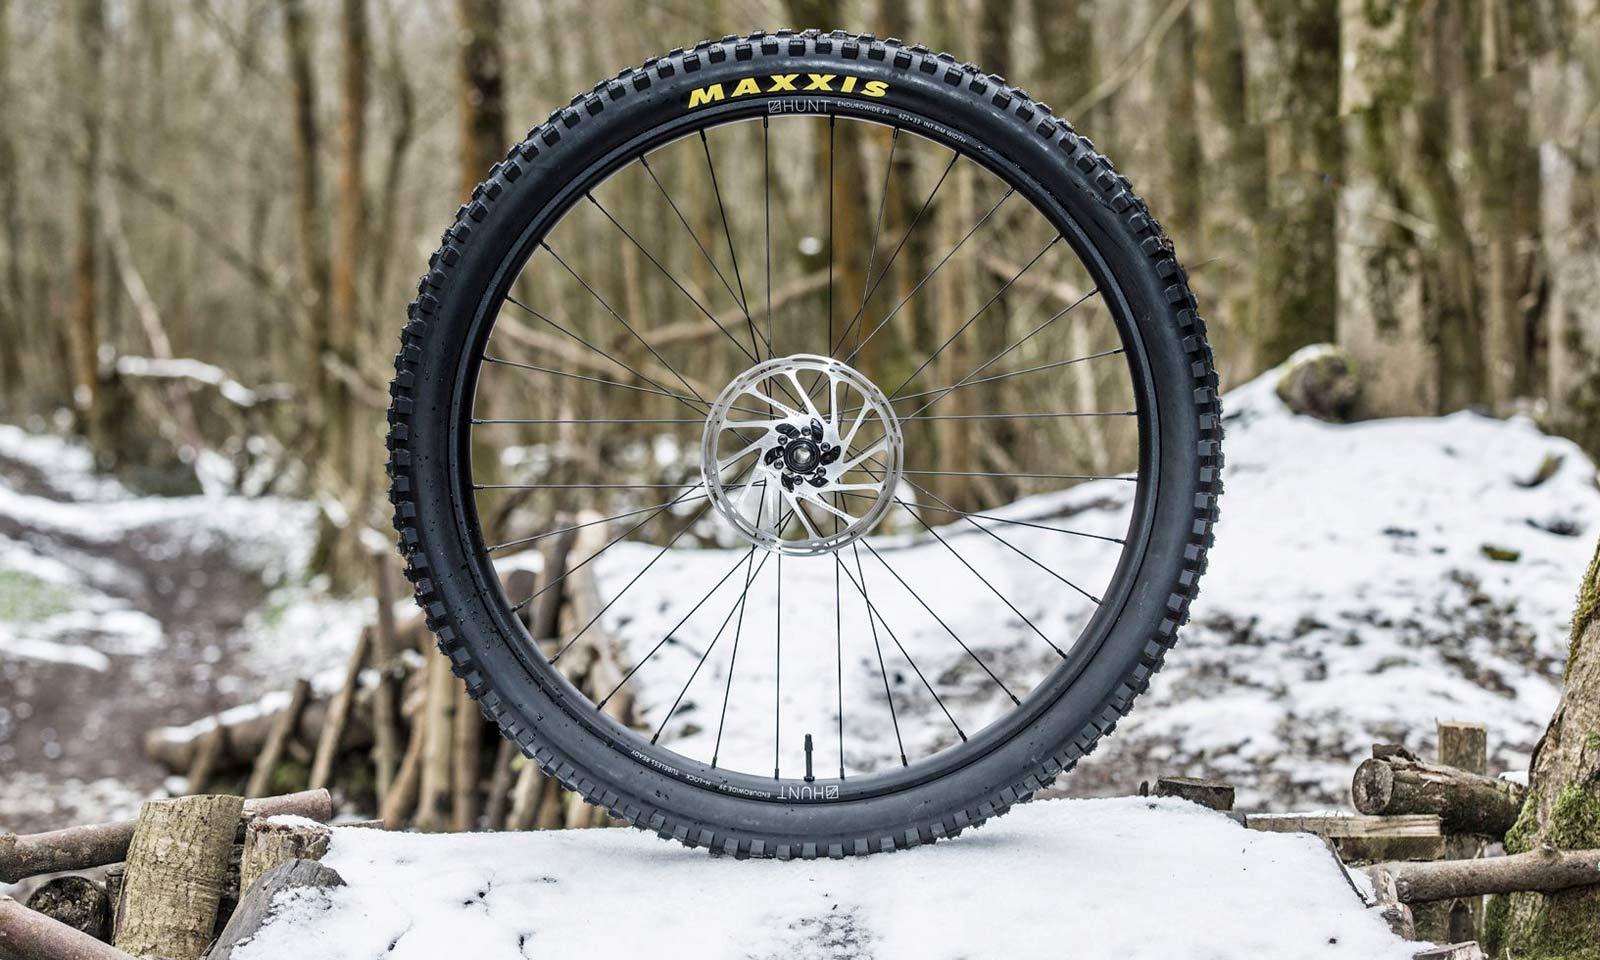 hunt endurowide mtb wheels 29er 35mm internal rim width